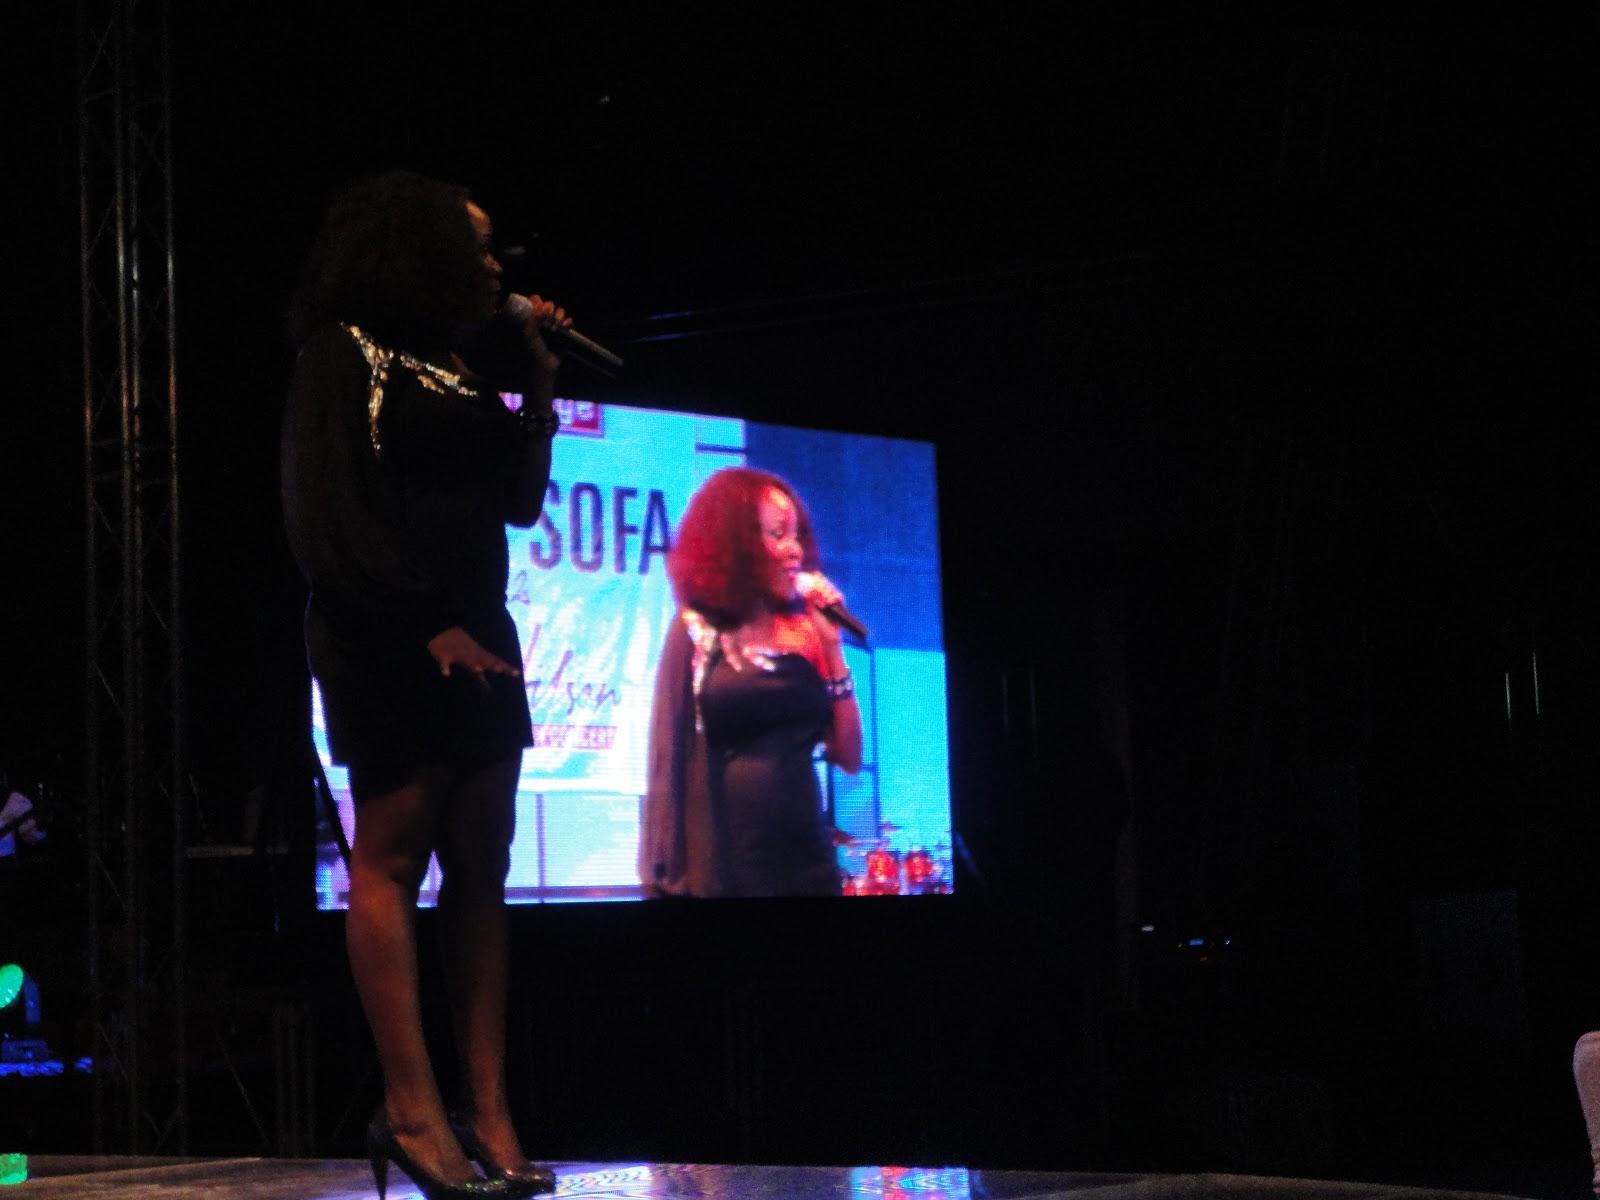 Peterkundum Face Of Sofa Keri Hilson Live In Abuja Claims Her